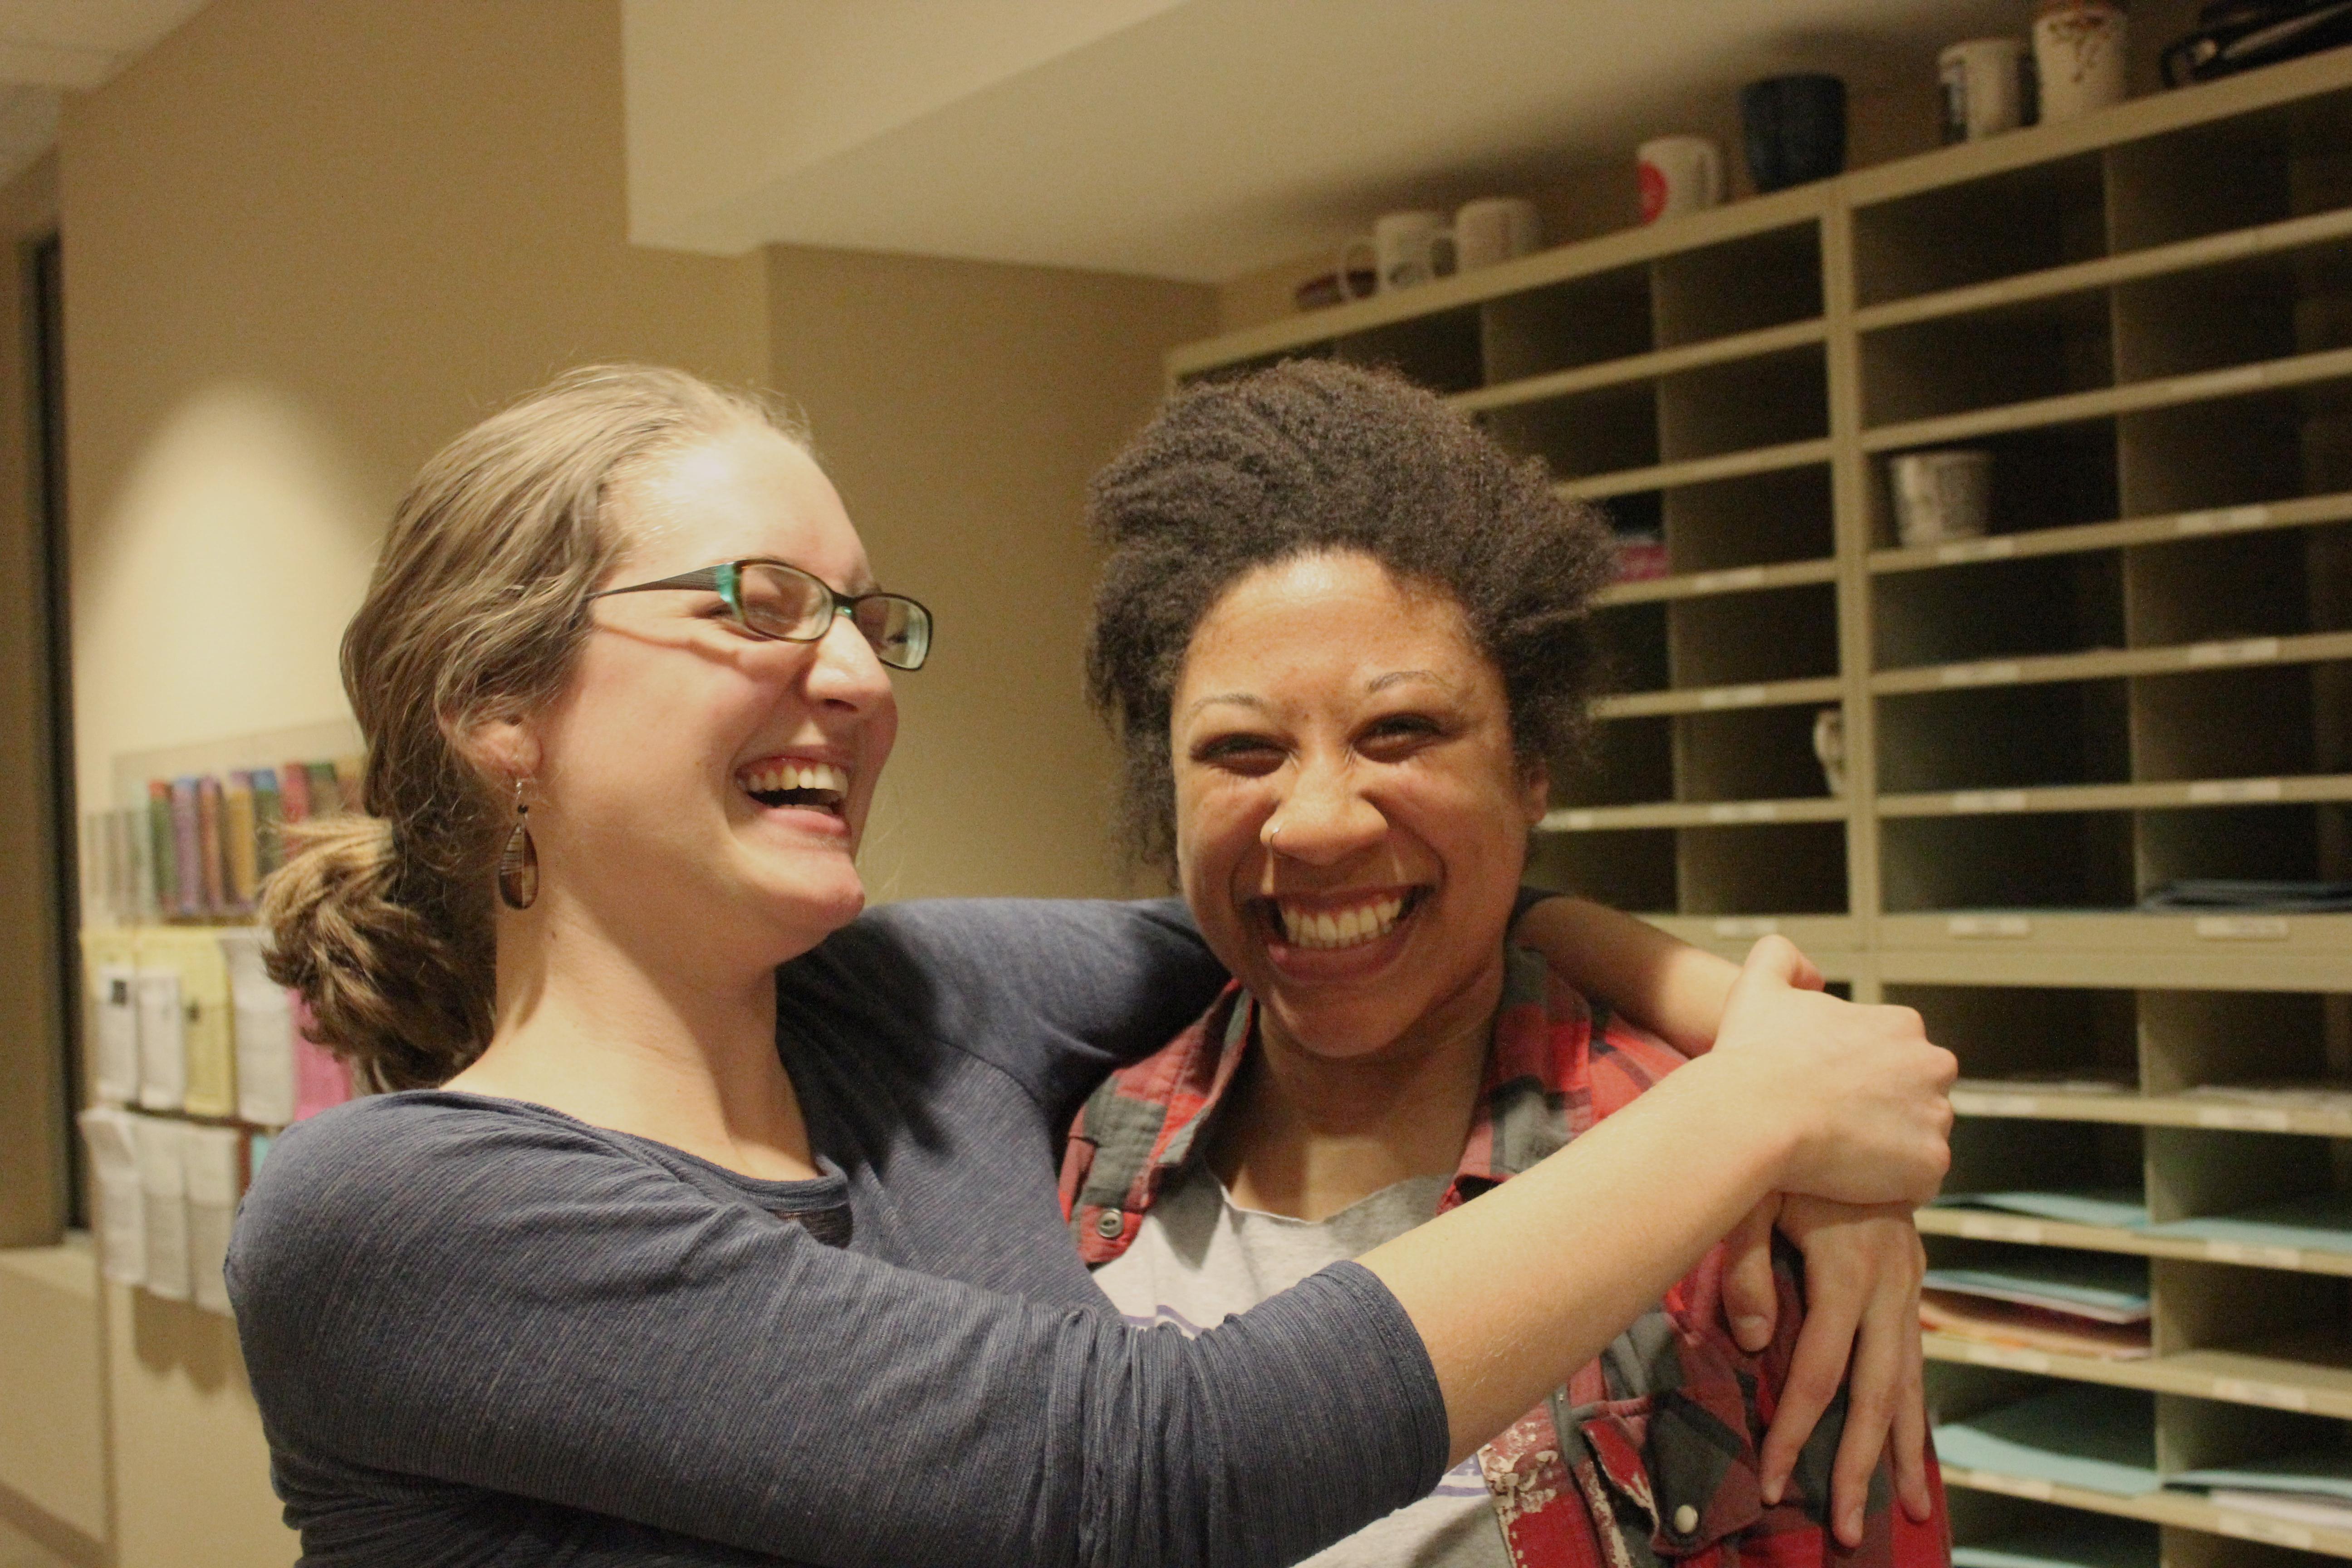 Eva Lapp and Dominique Chew laugh and embrace